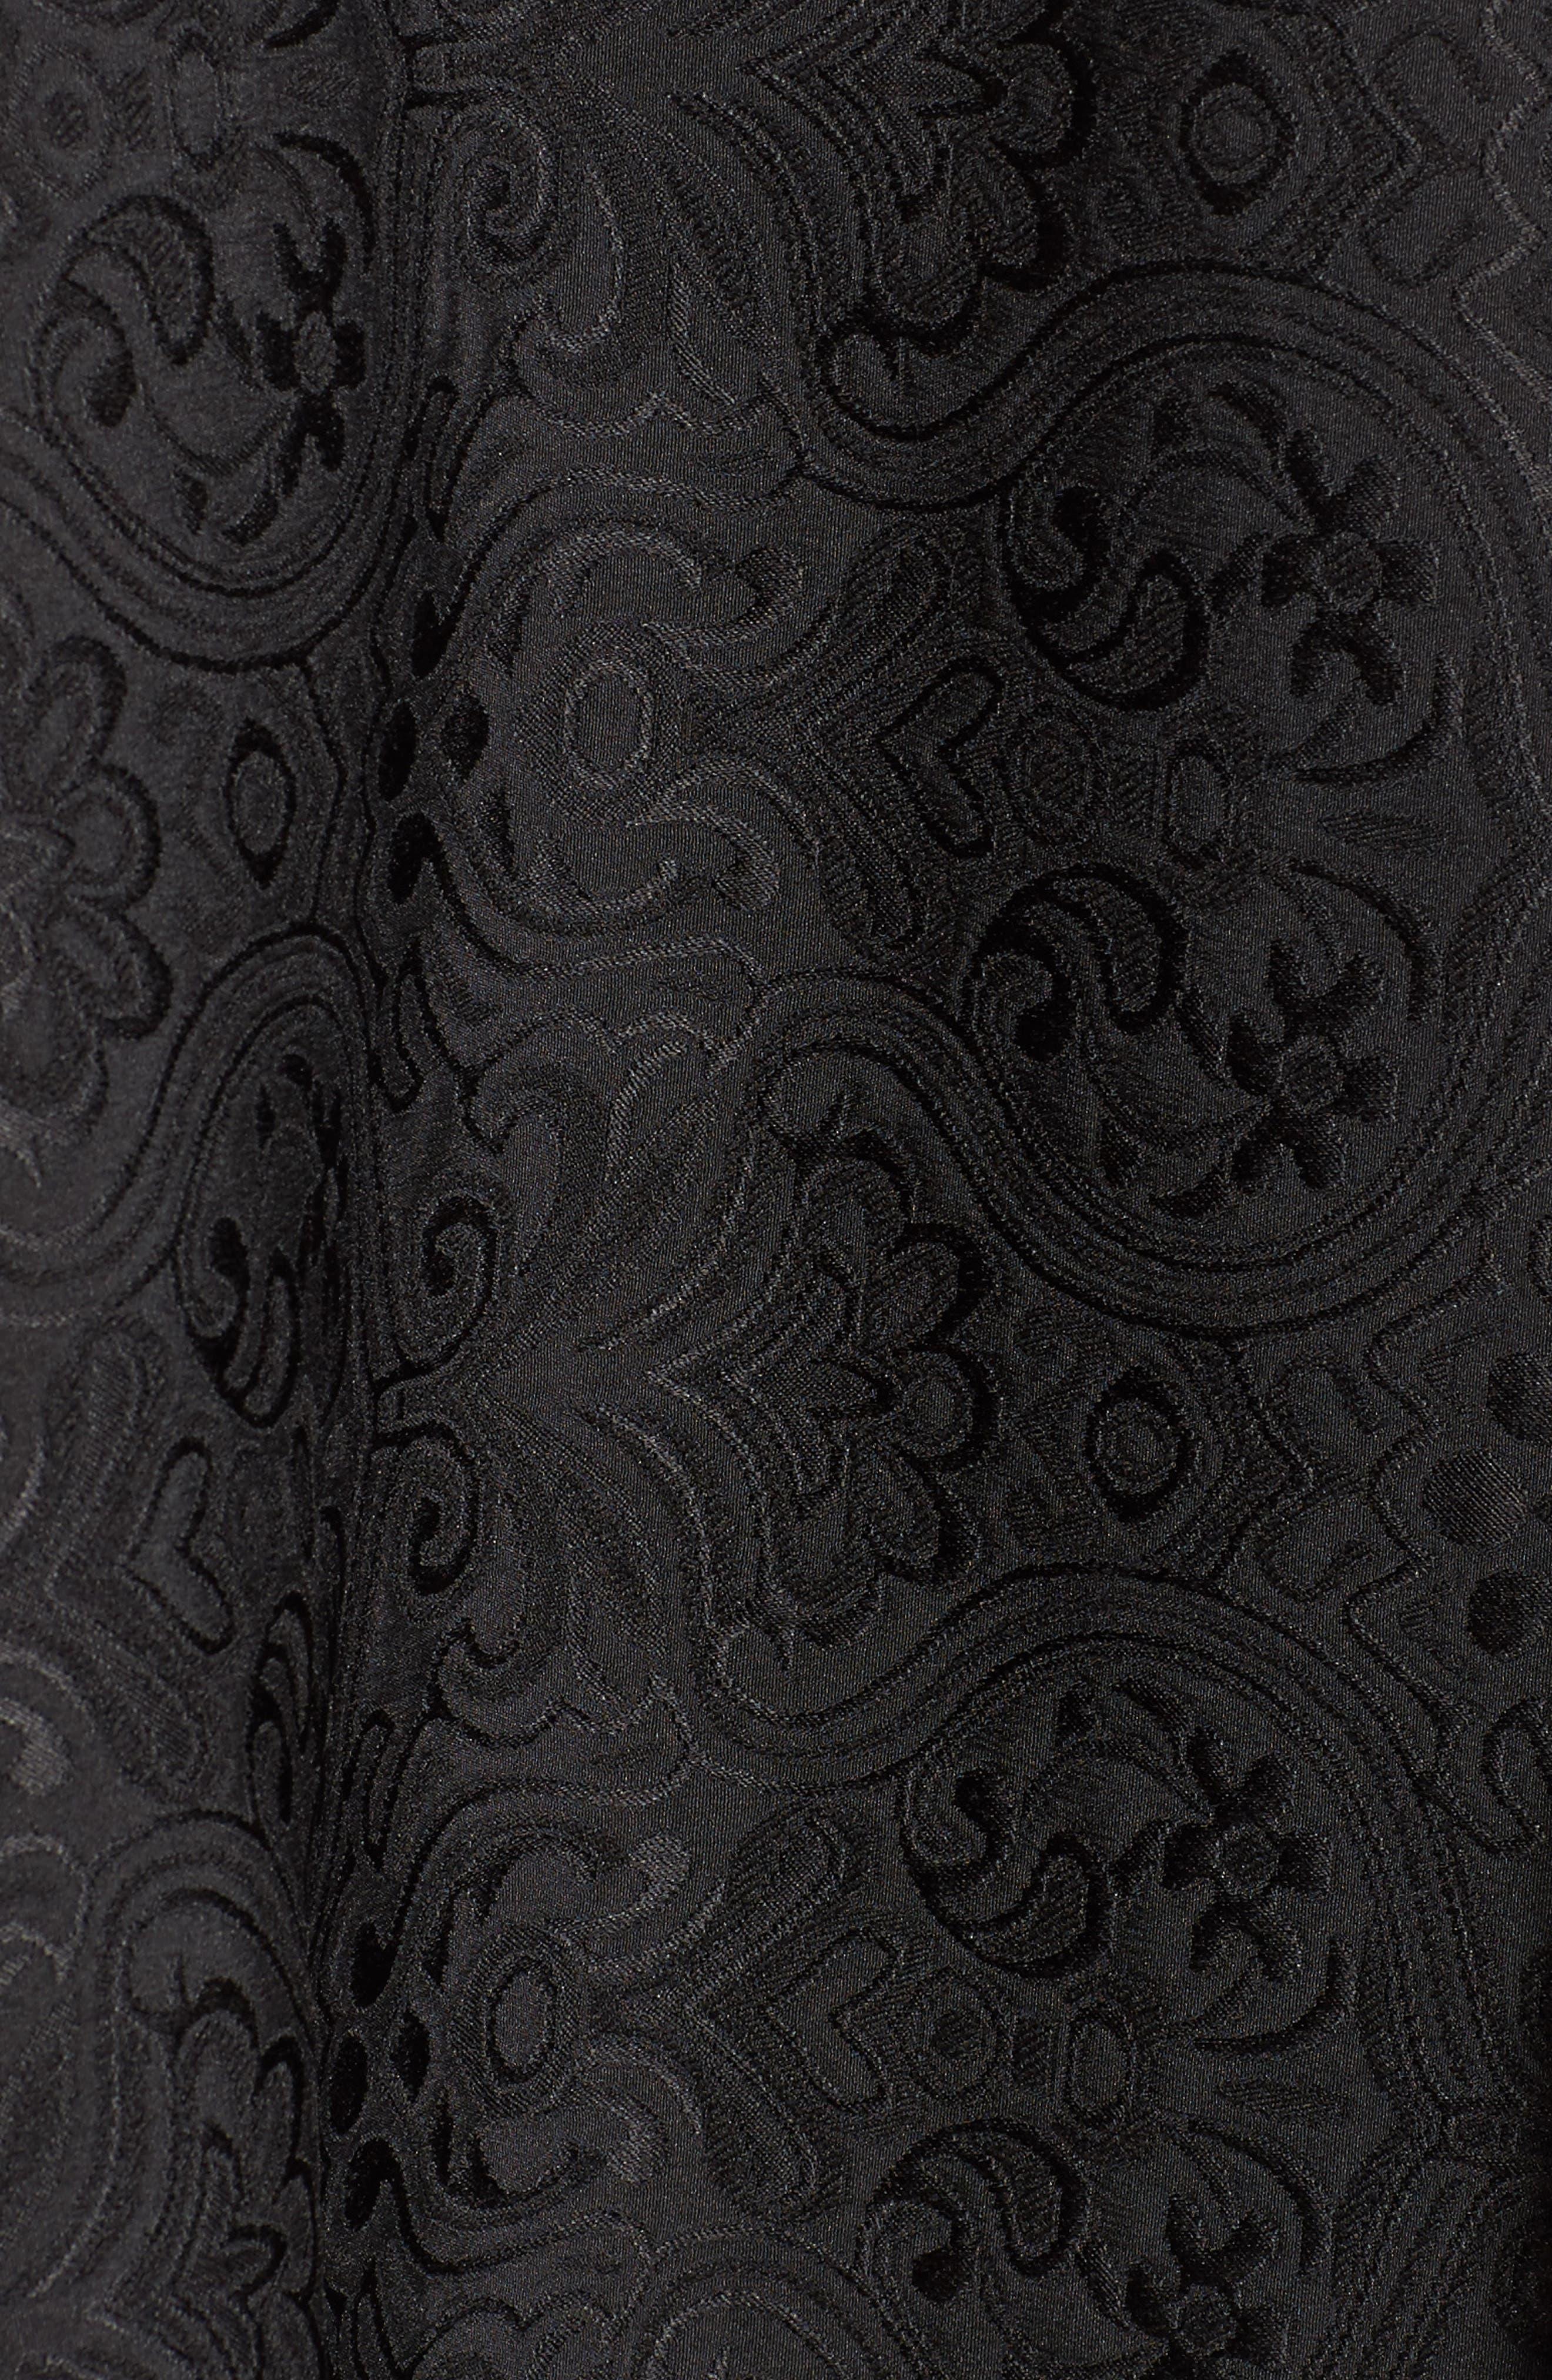 Embellished Cutout Back Cocktail Dress,                             Alternate thumbnail 5, color,                             Black Ivory